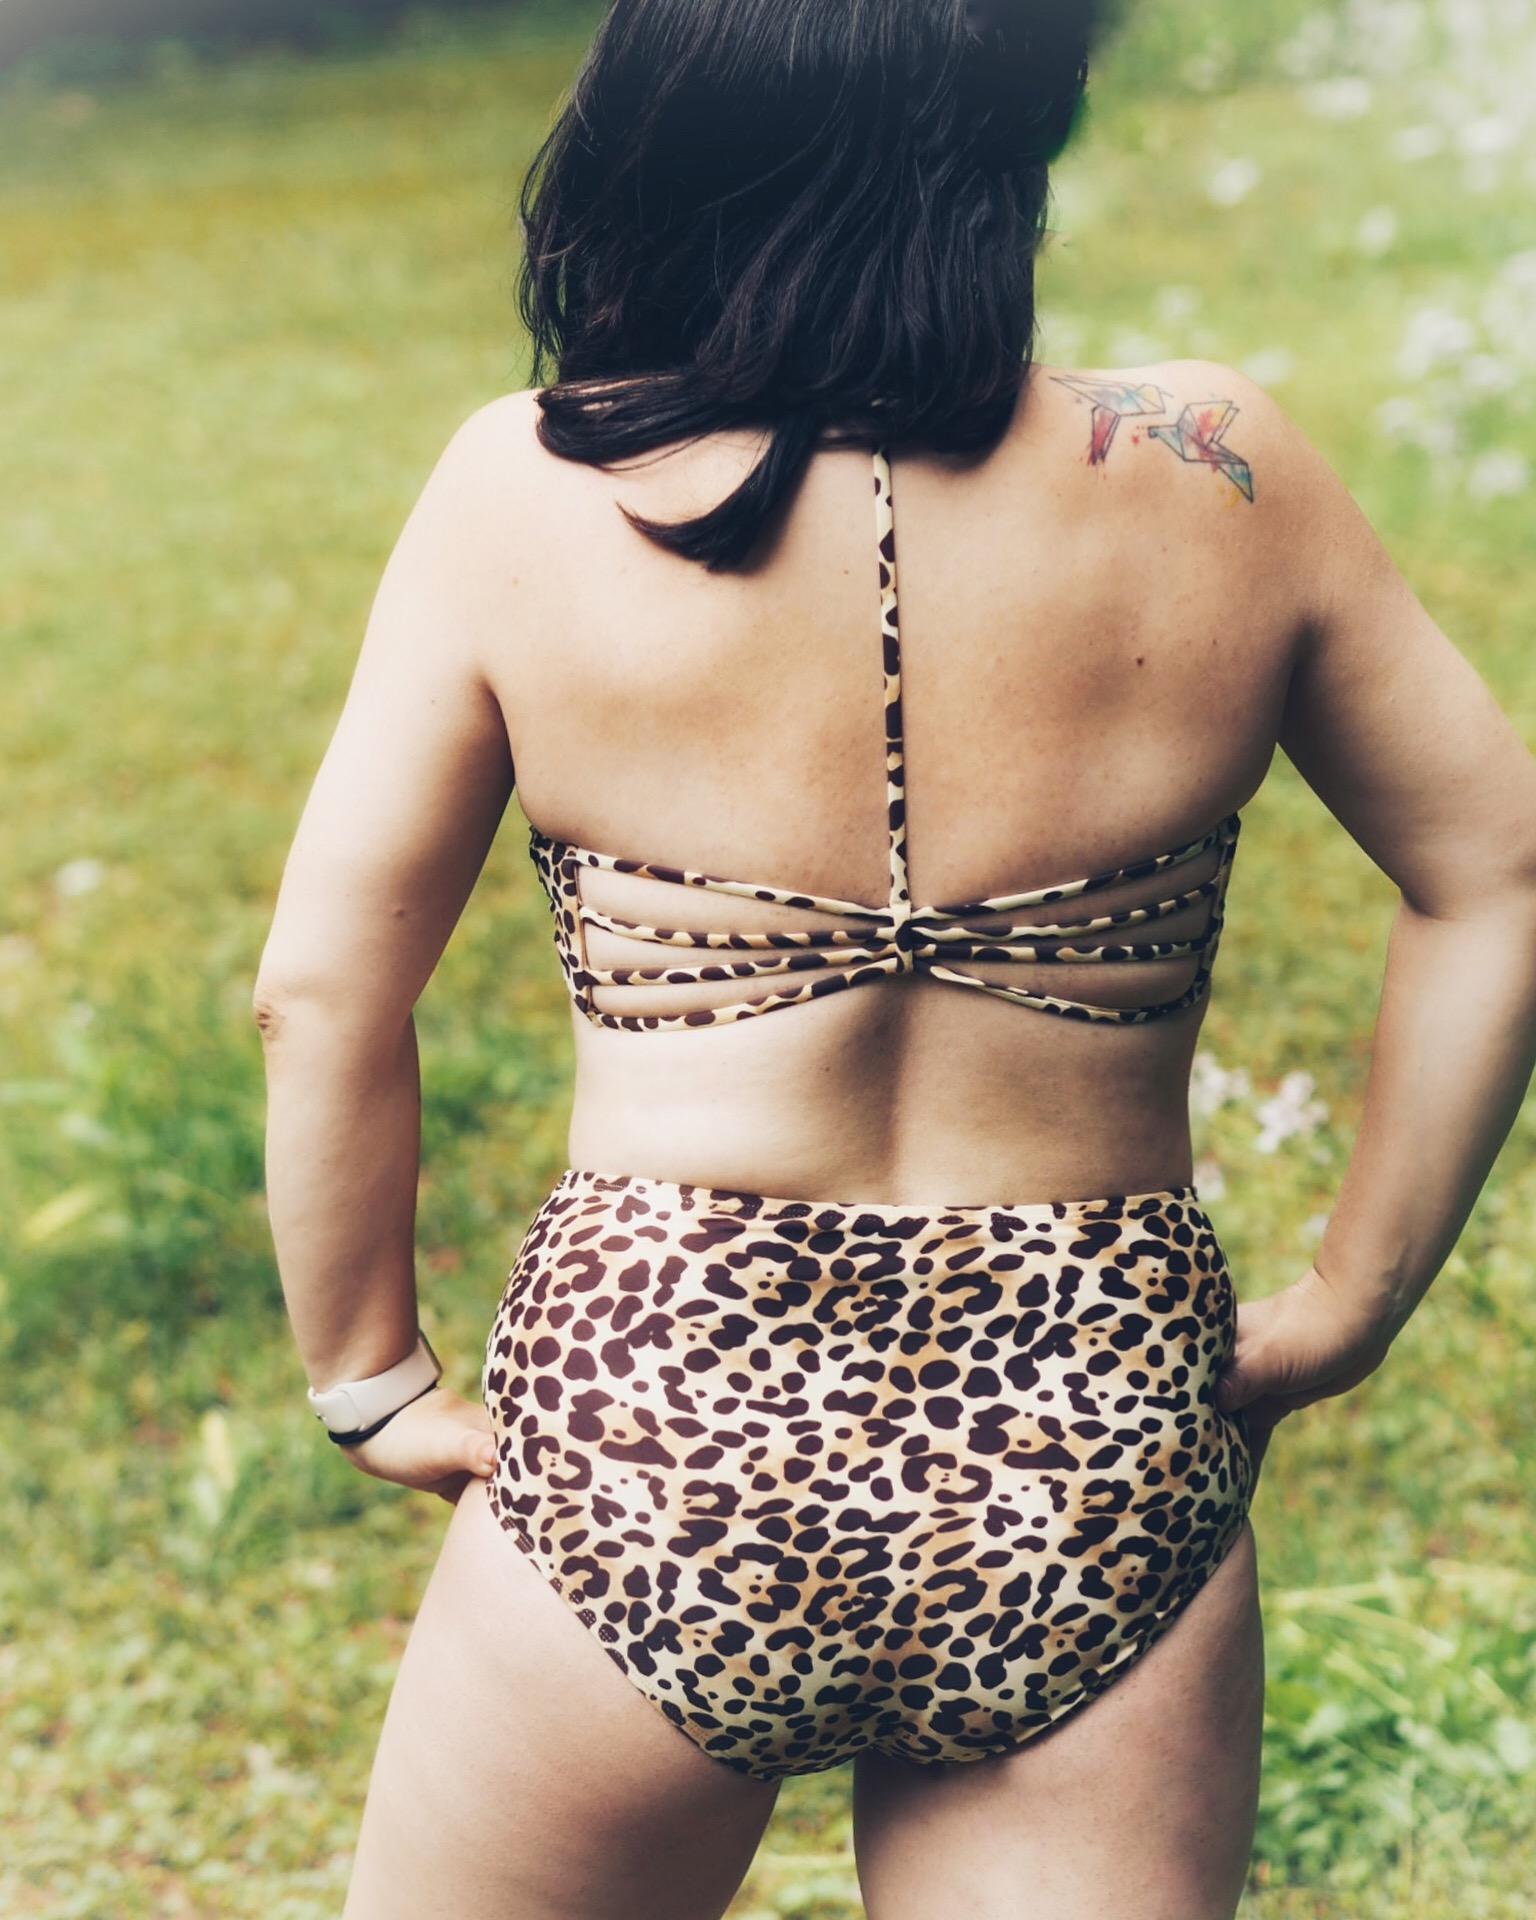 bikini back.JPG